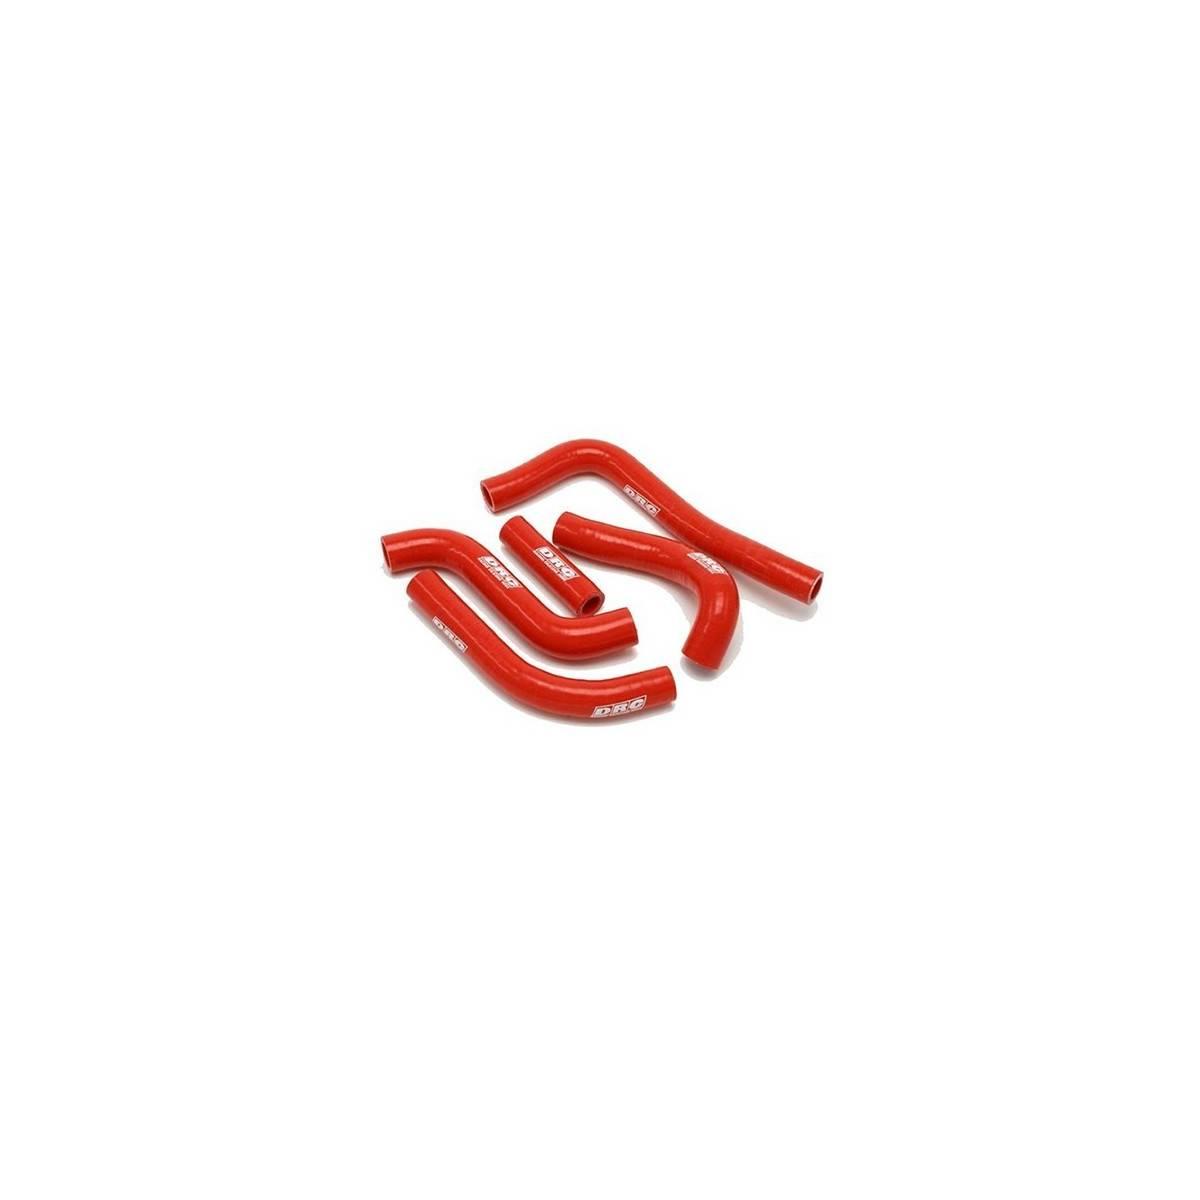 D47.01.063 - Kit Manguitos Radiador Honda Crf250R ´14 Rojo